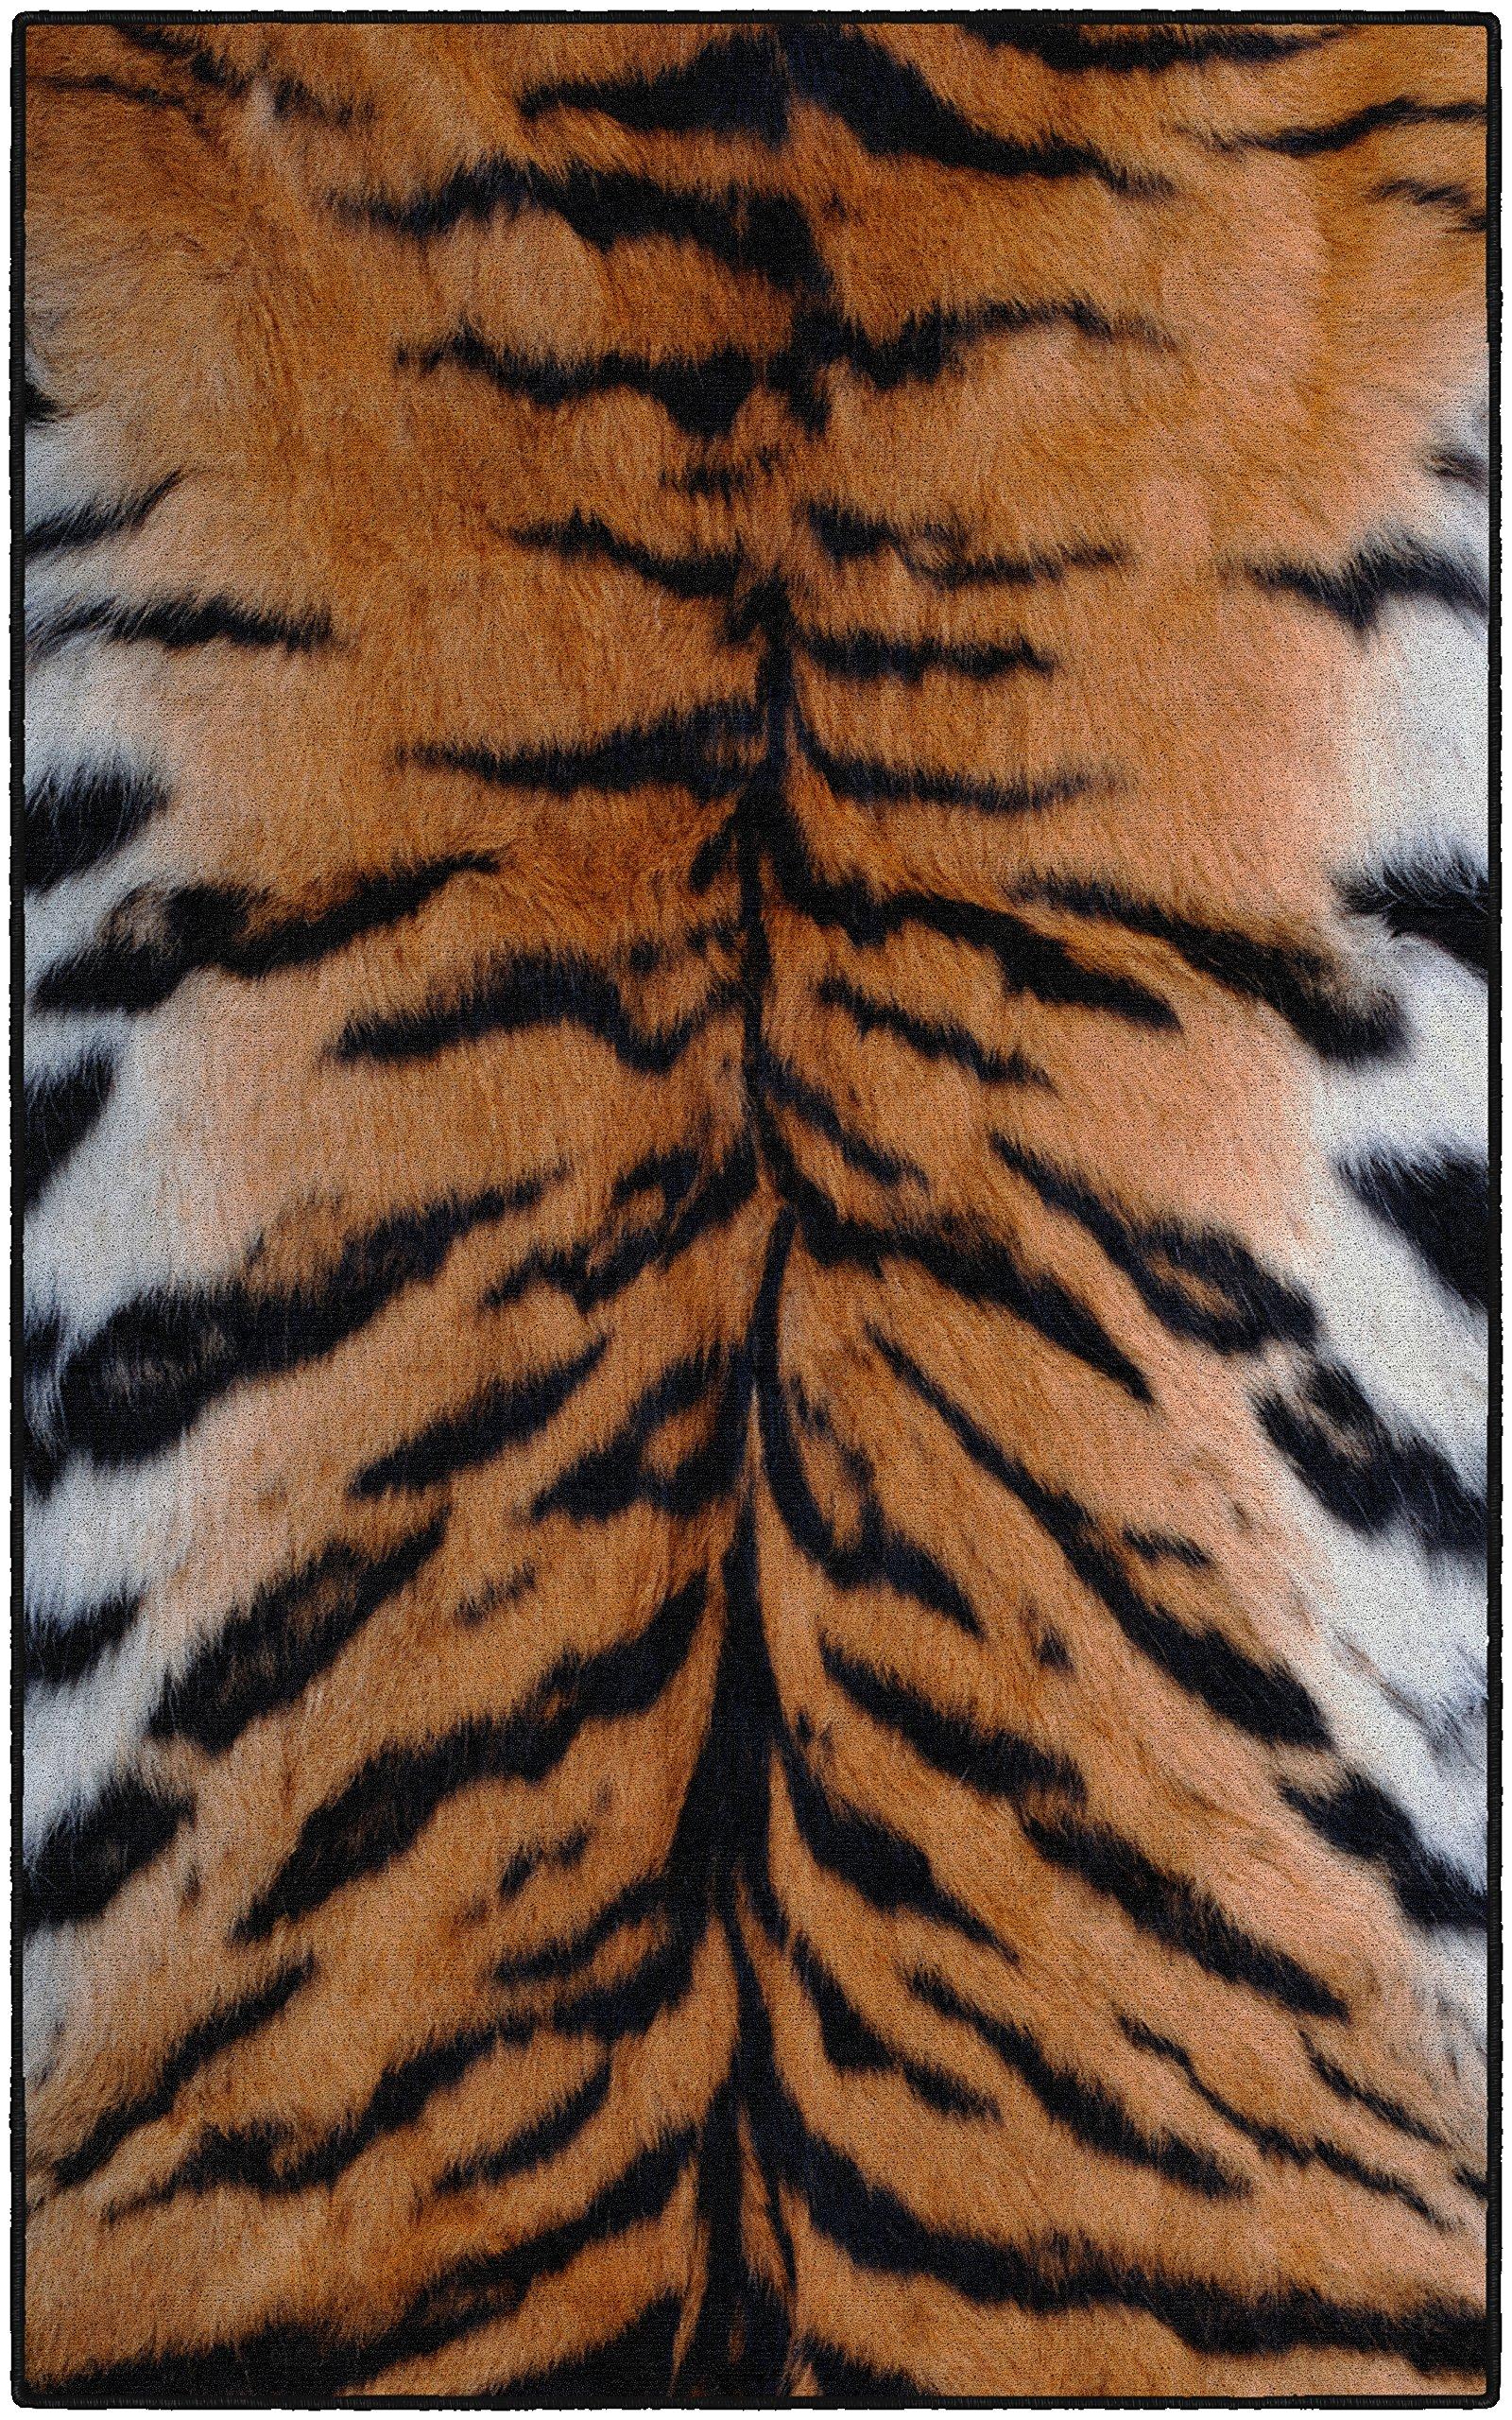 Brumlow Mills EW10211-40x60 Tiger Stripes Animal Print Area Rug, 3'4 x 5'